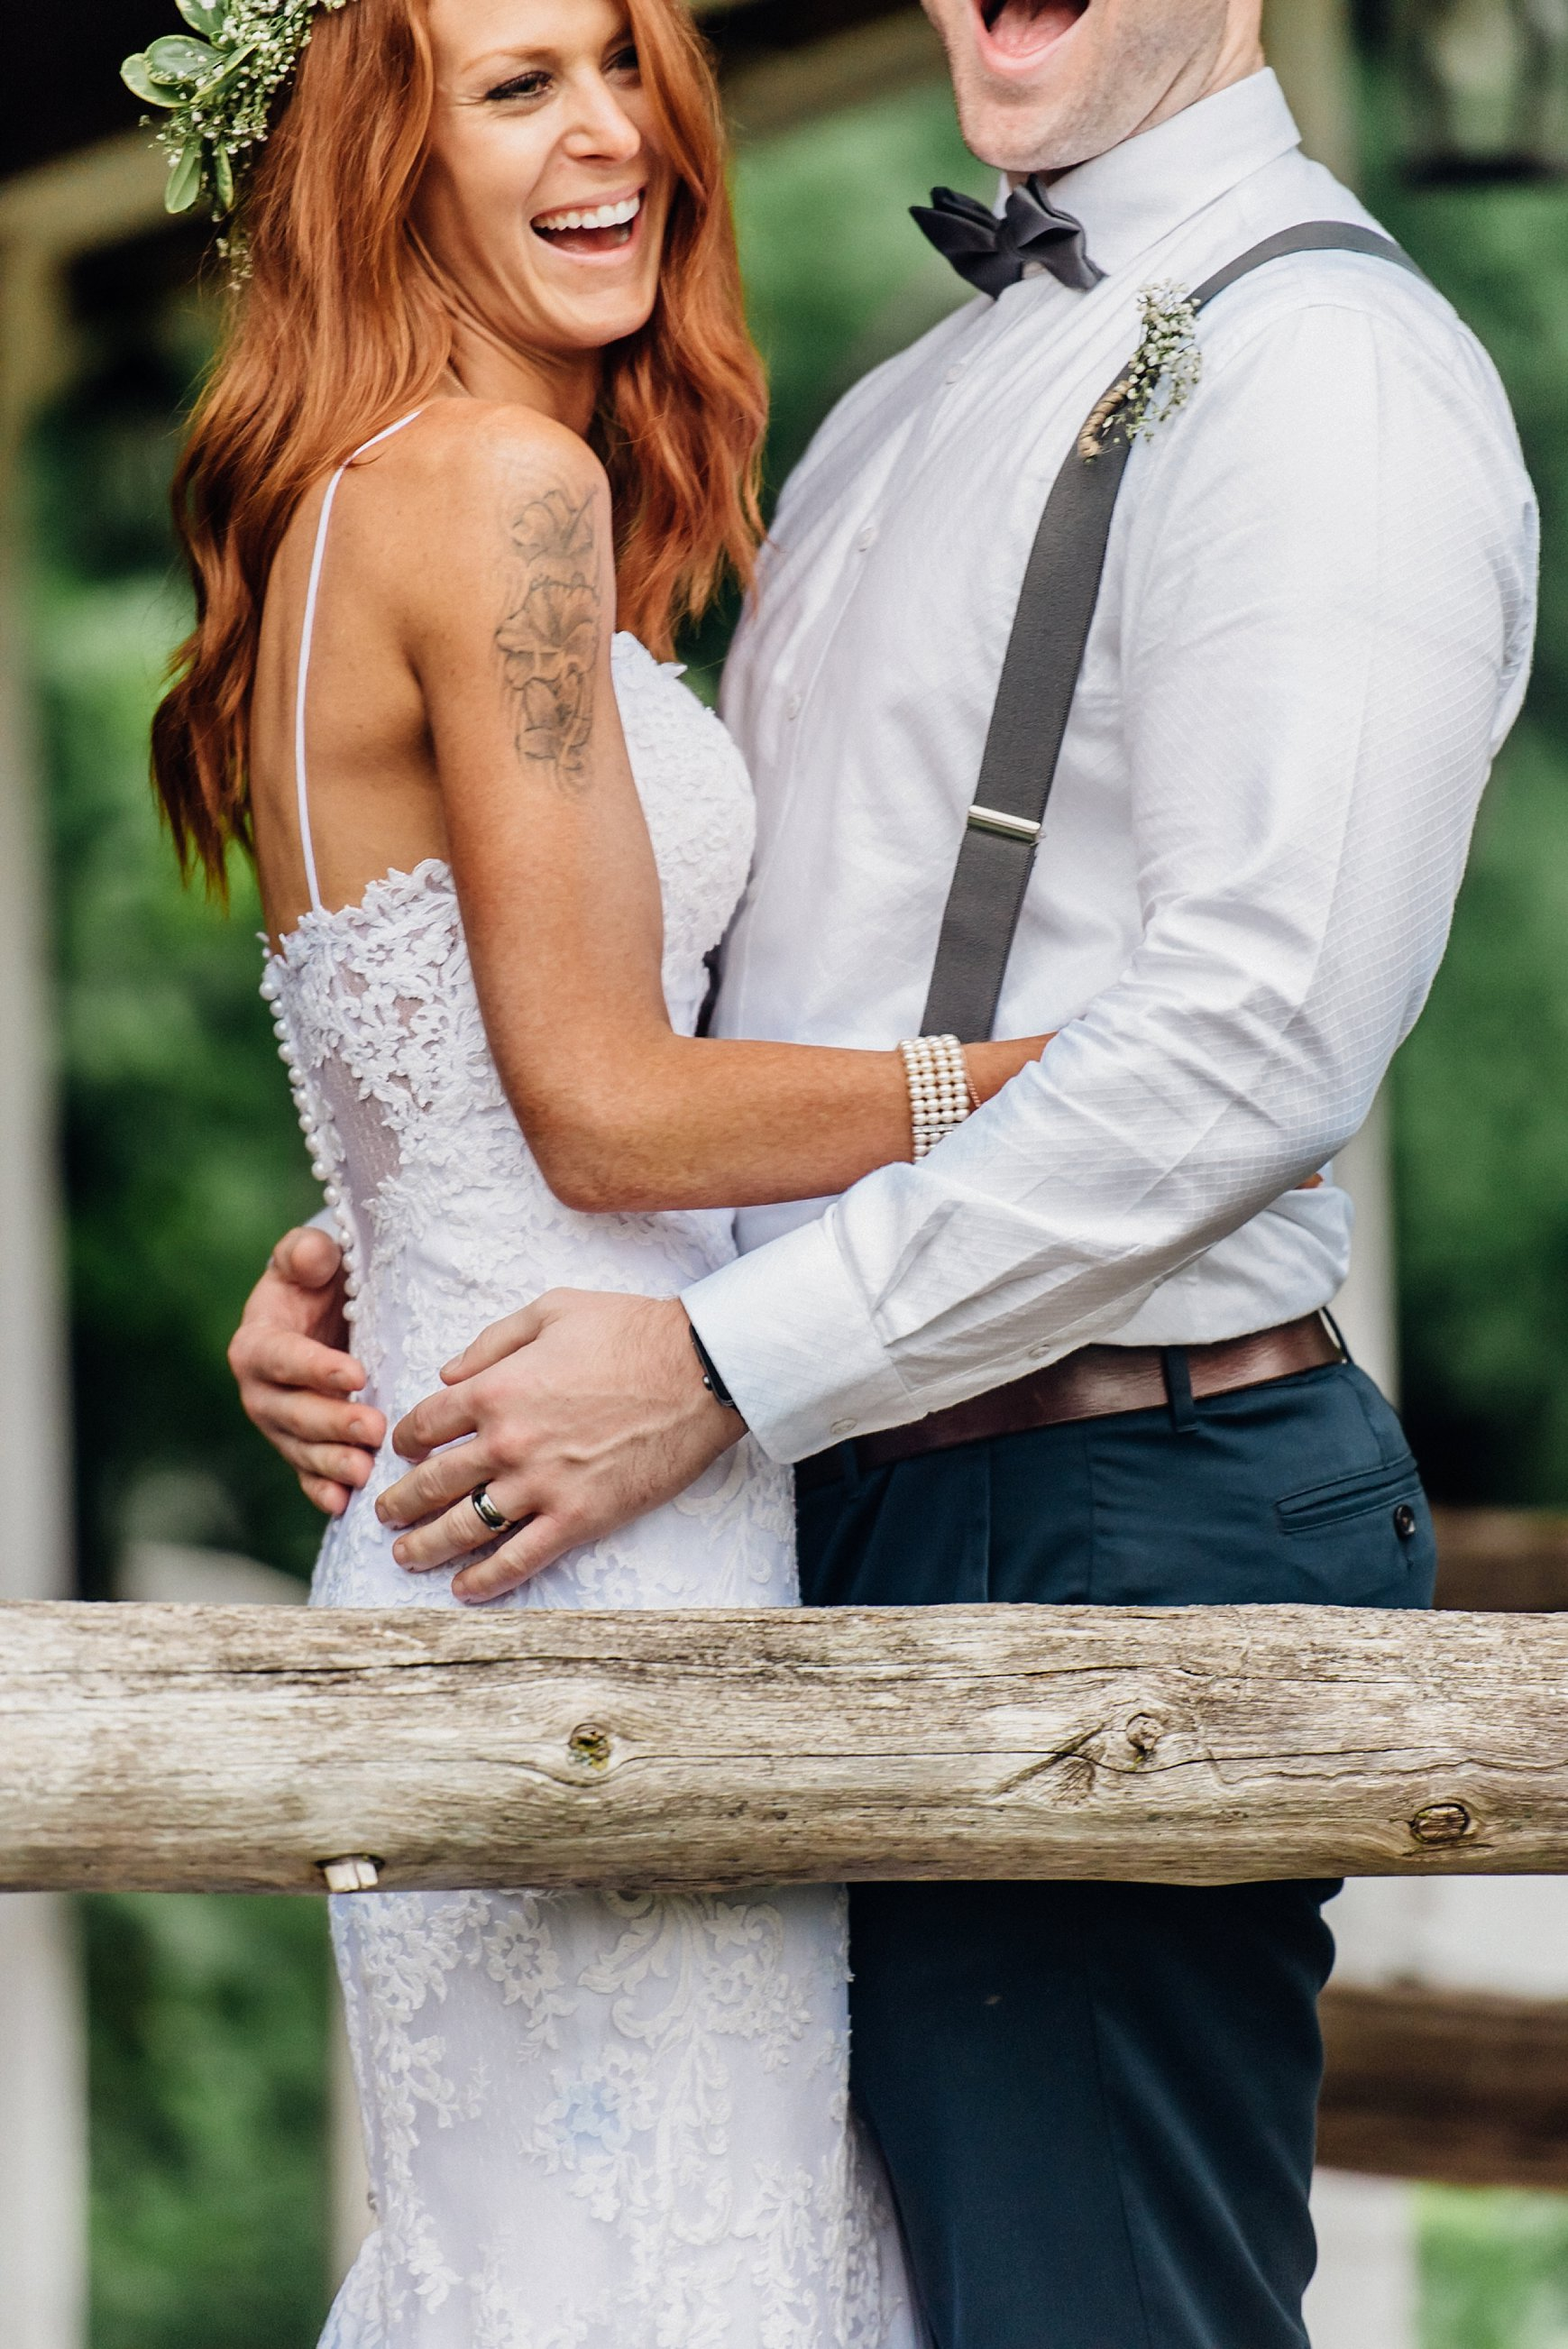 Ottawa Wedding Photographer - Stanley's Olde Maple Lane Barn Wedding - Ali & Batoul Photography_0053.jpg